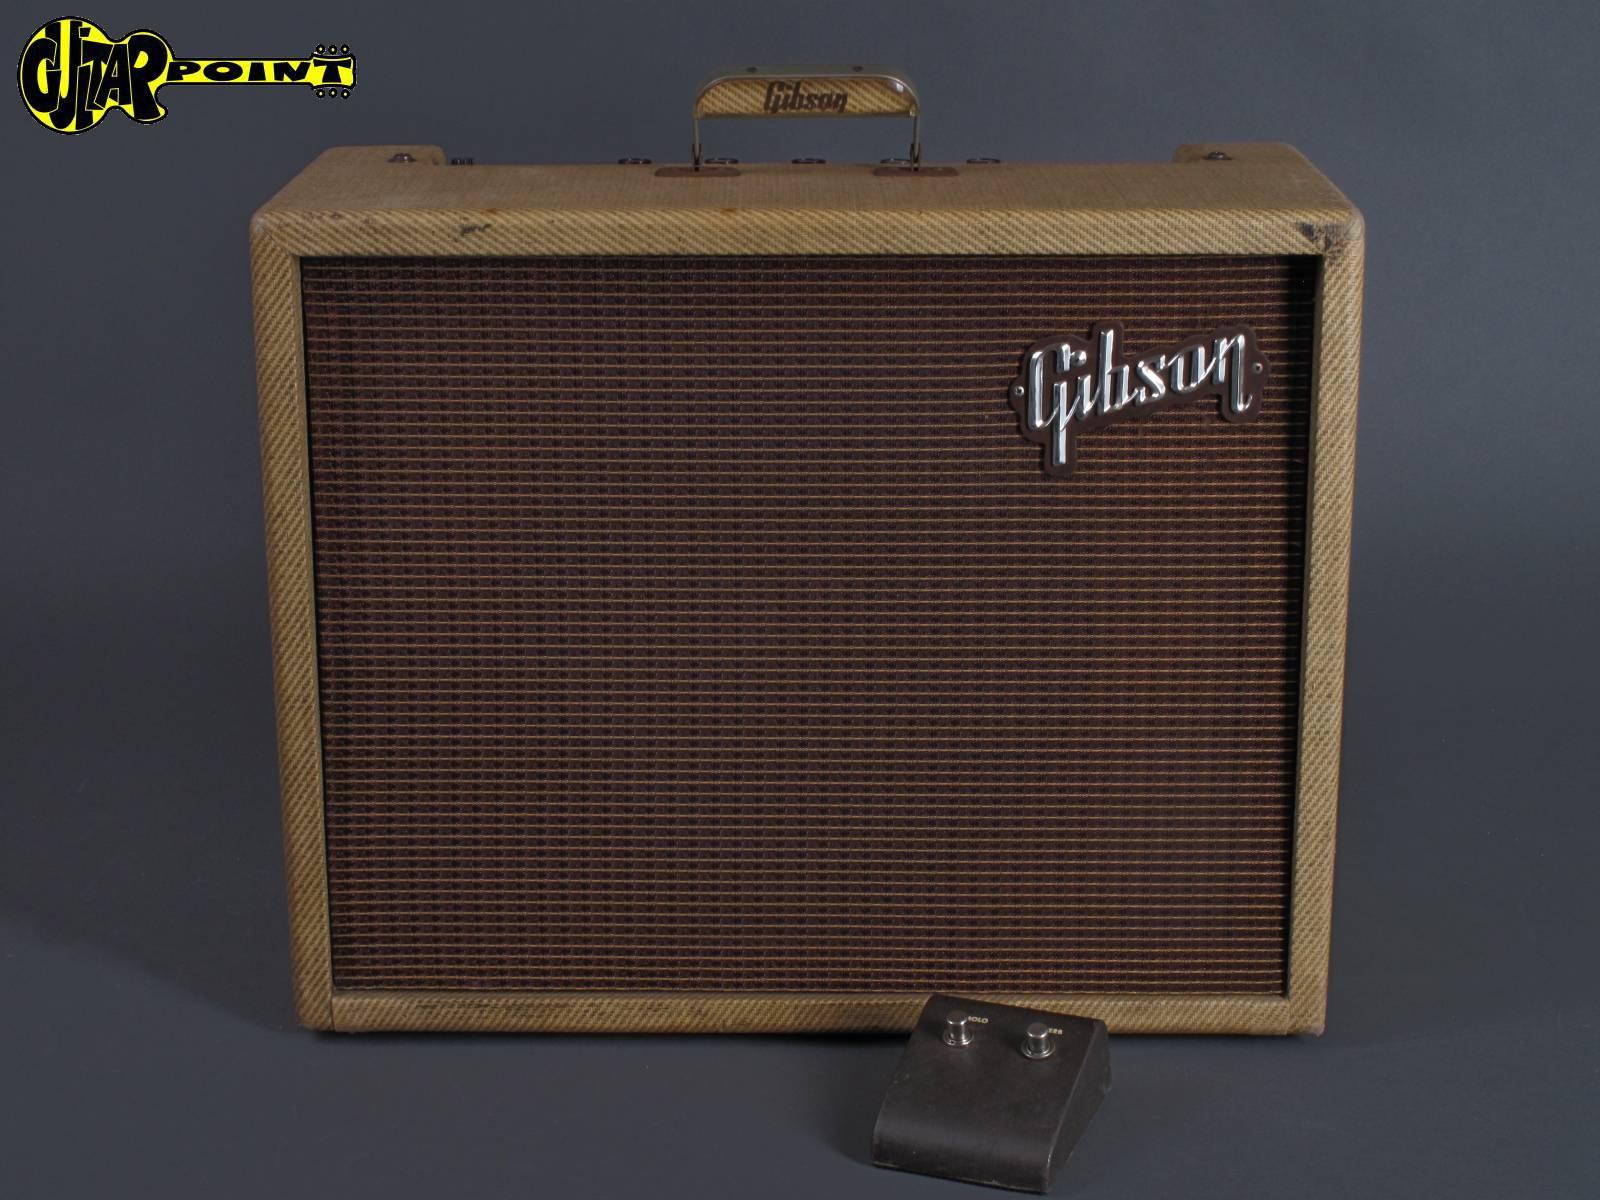 1962 Gibson GA-19 RVT Falcon - Tweed/Reverb